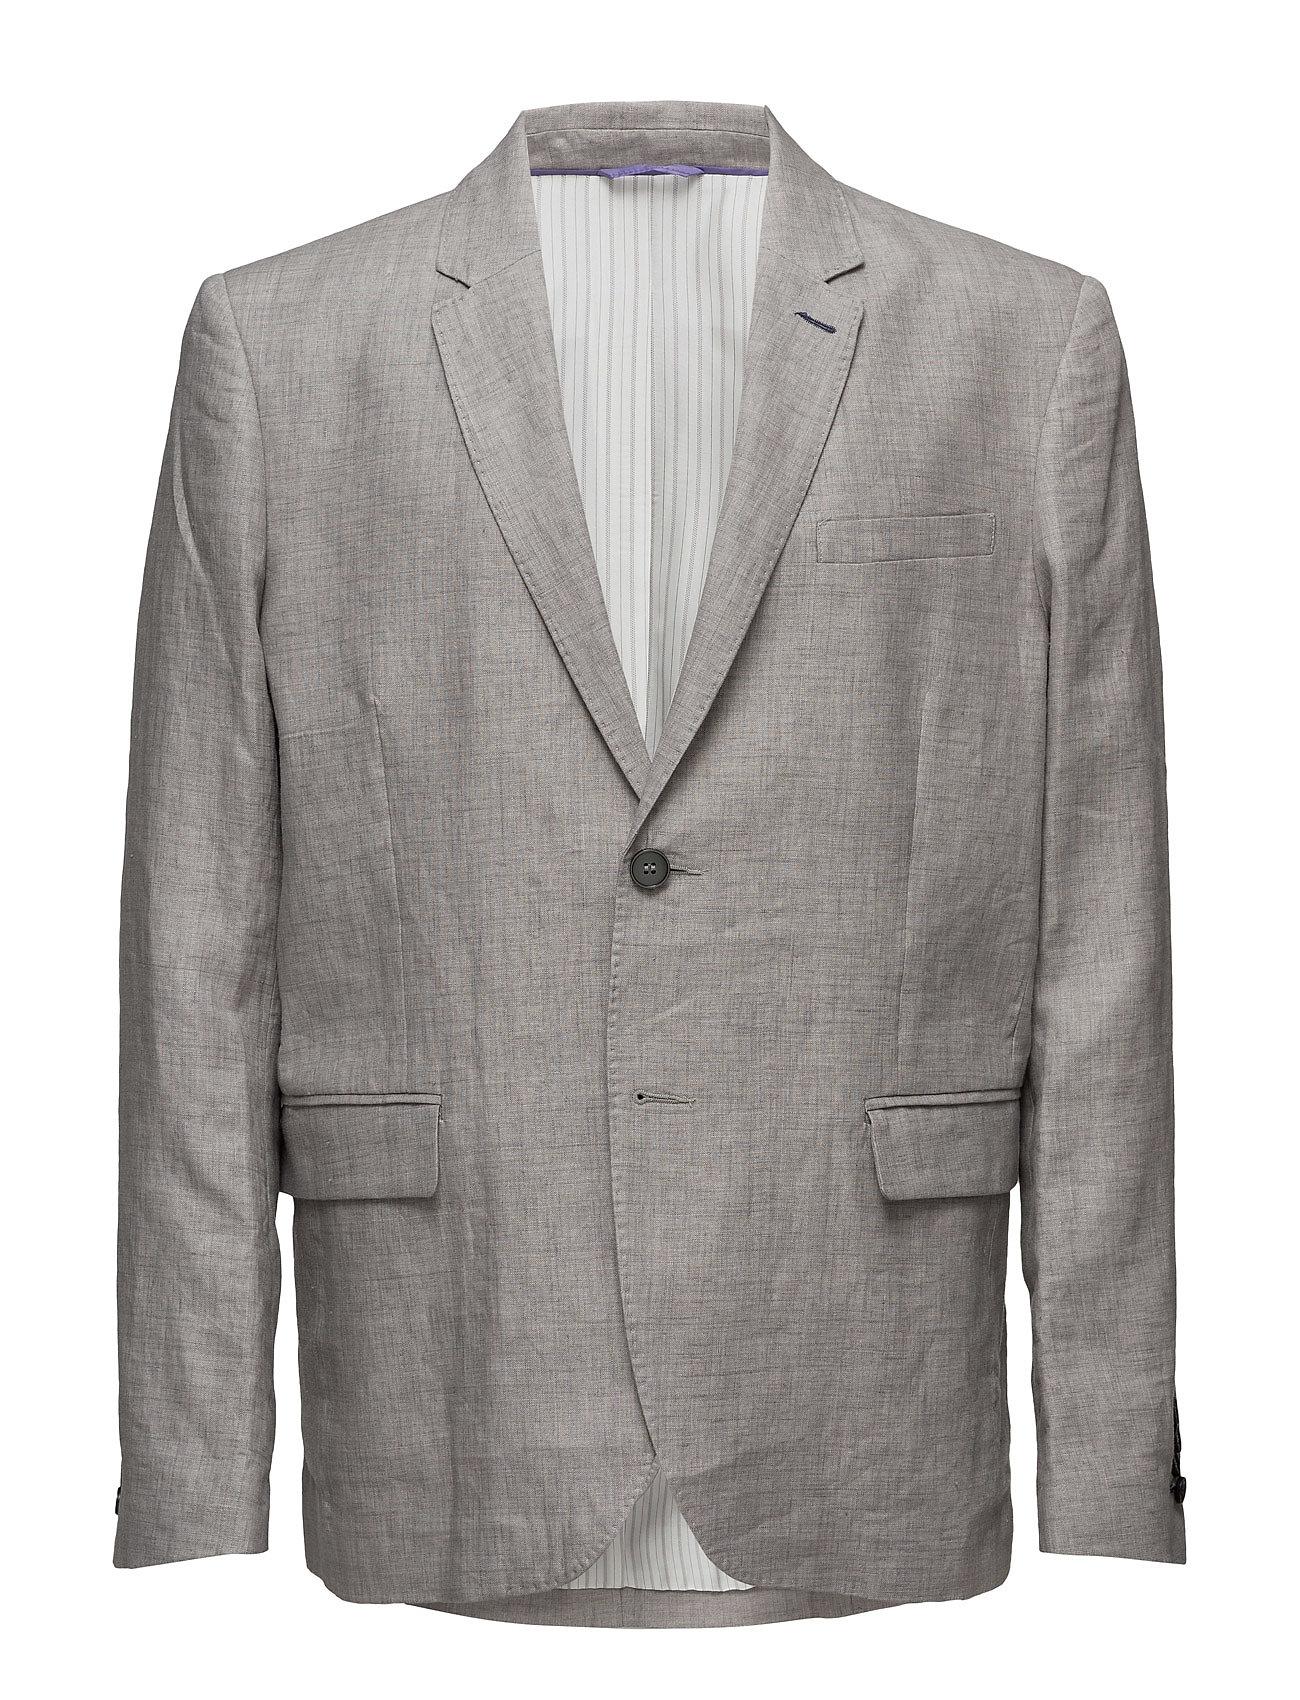 Jacket United Colors of Benetton Blazere til Herrer i